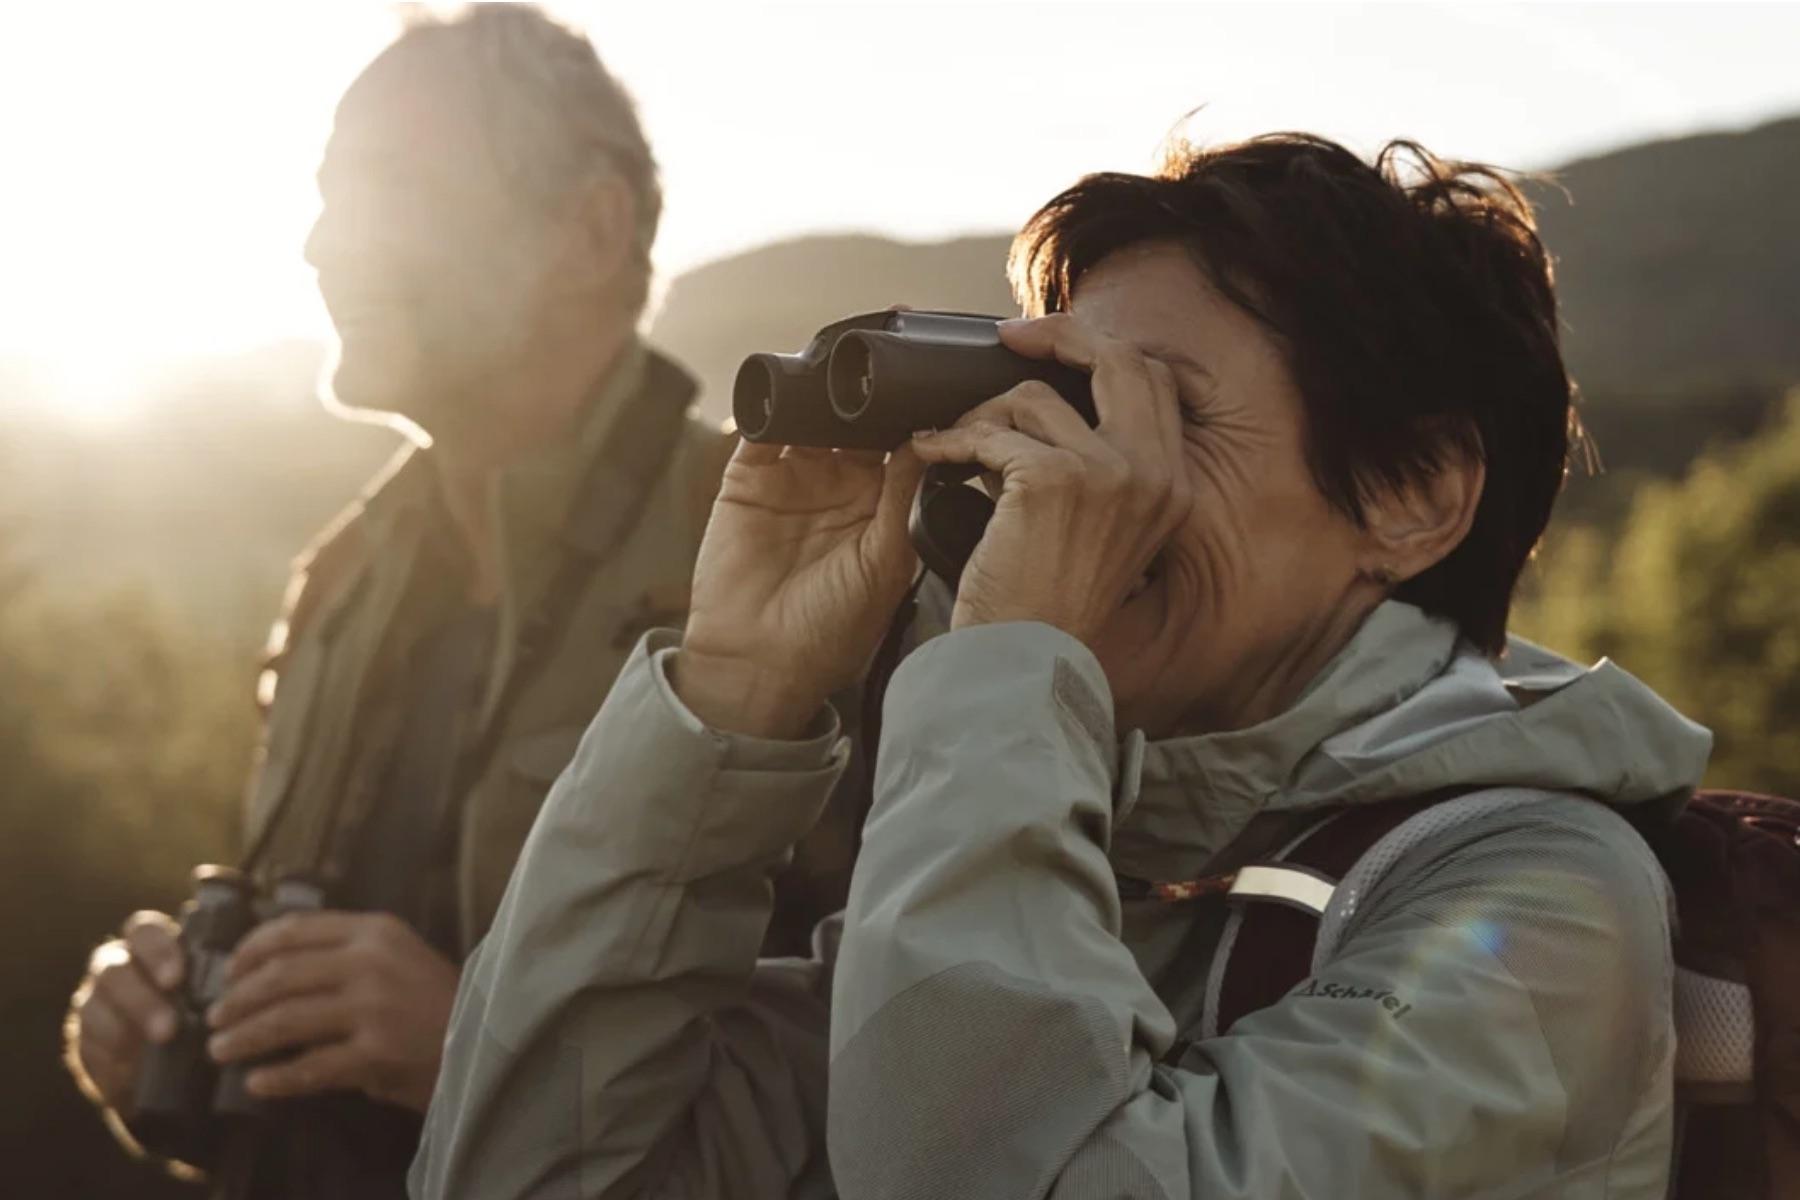 Swarovski Optik's CL Pocket binoculars updated